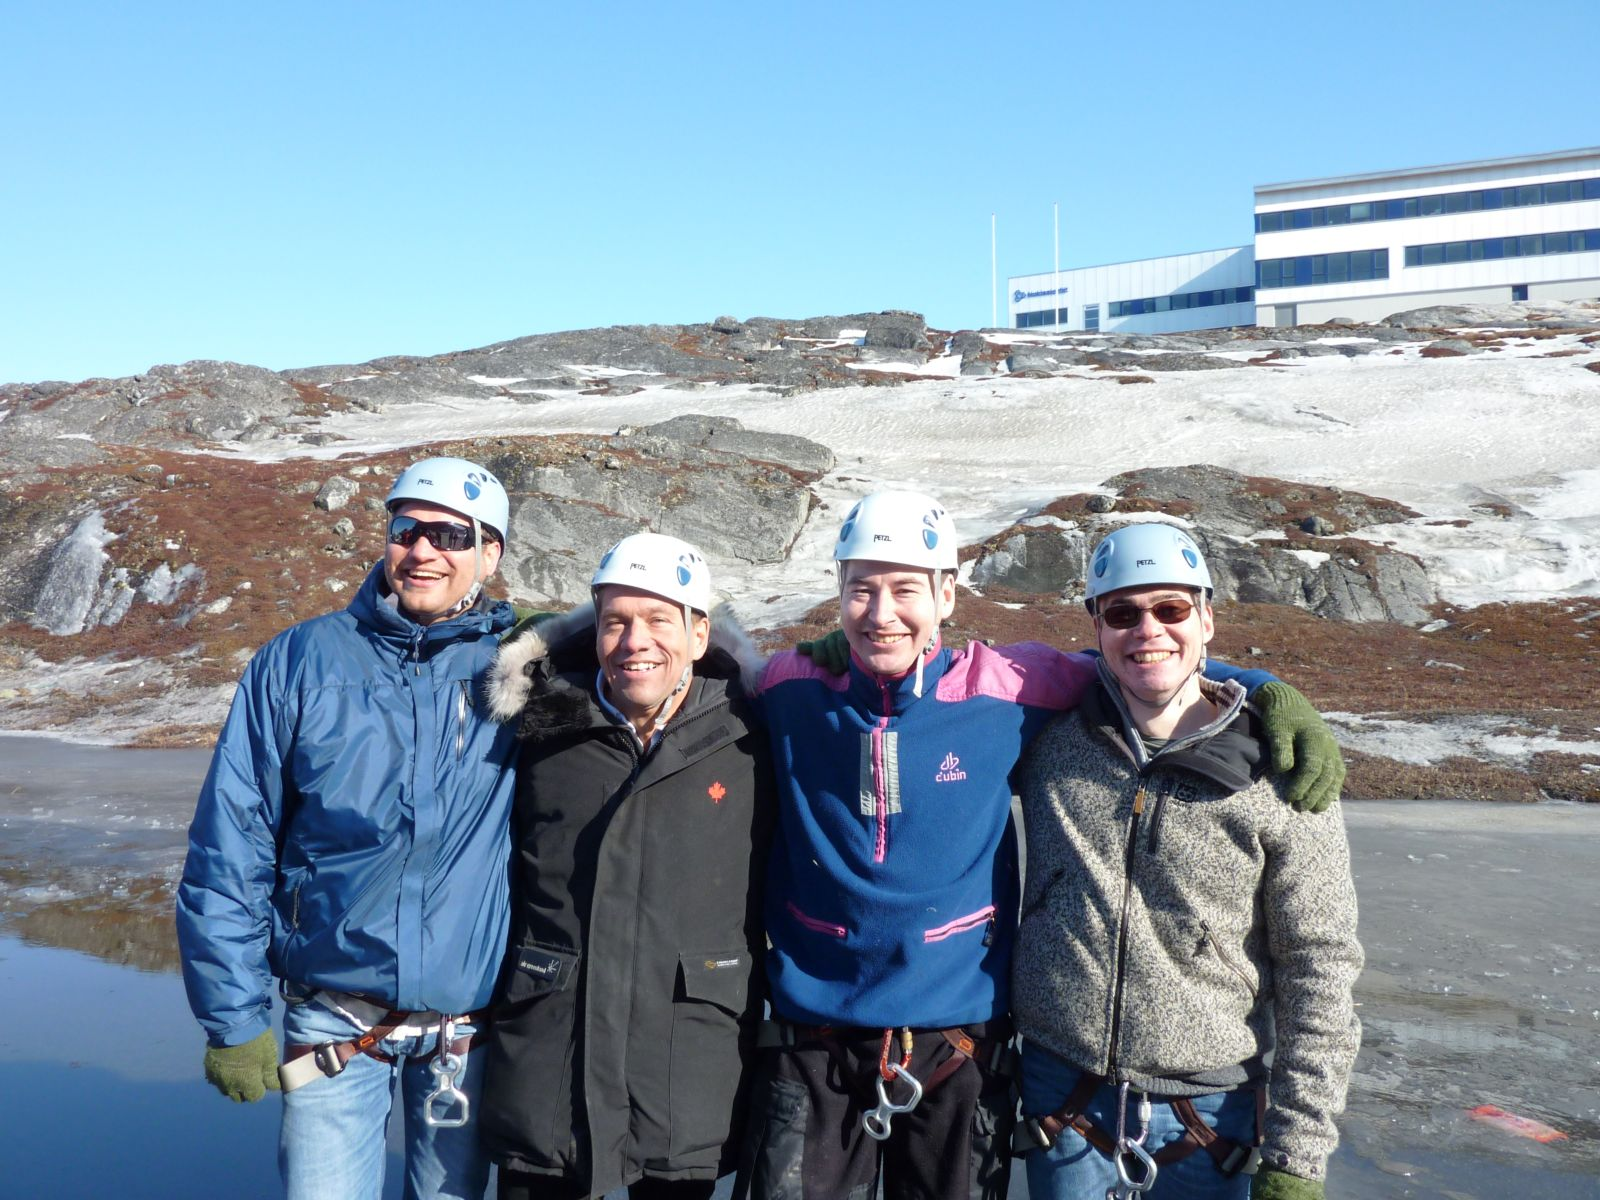 2010-04-10-1615_-_Henrik Steinbacher; Jesper Eugenius Labansen; John Telling; Svend Sværd_2